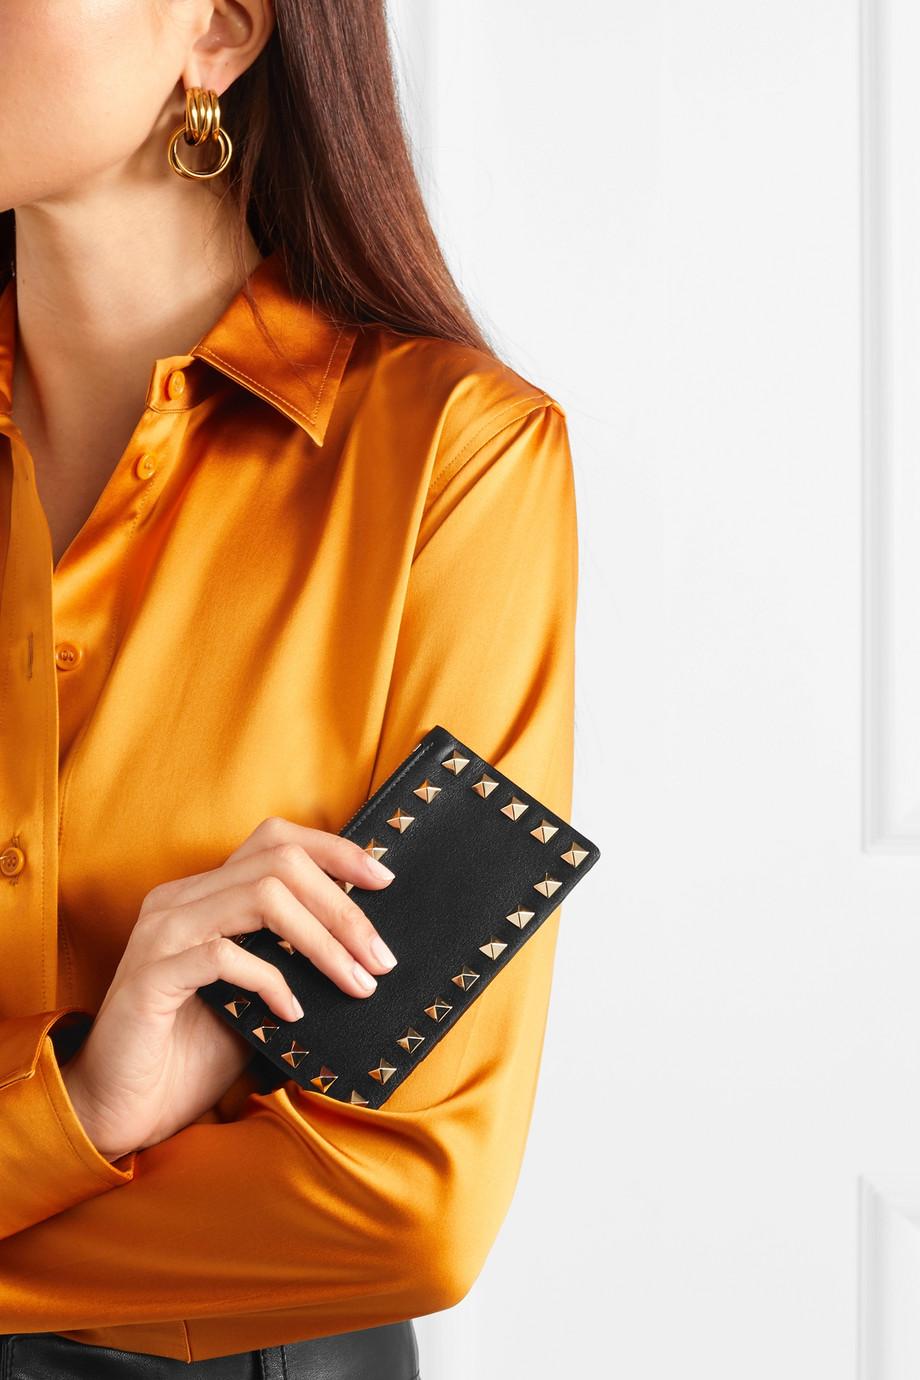 Valentino Valentino Garavani Rockstud leather cardholder